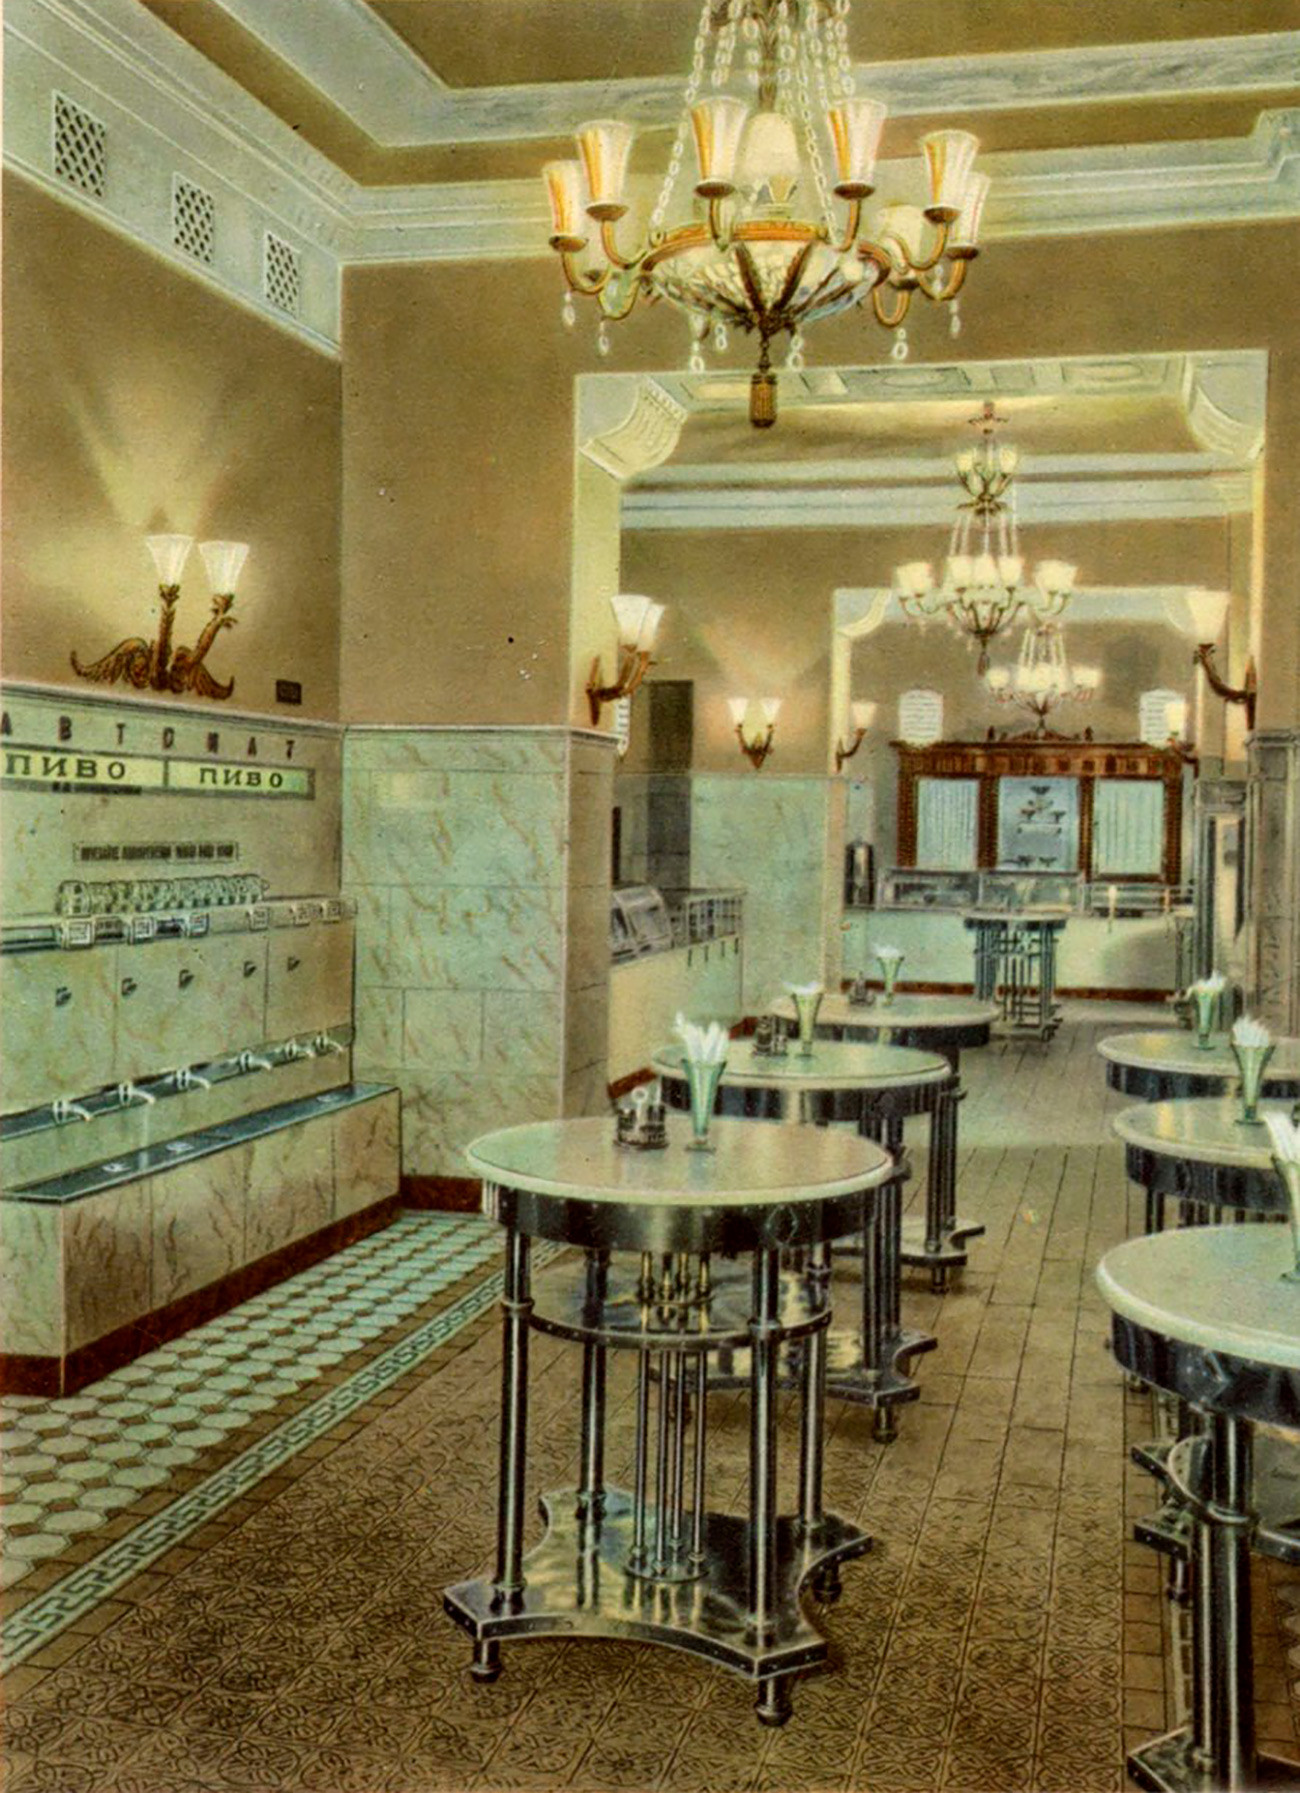 Café de autoservicio №9 de Mosnarpit